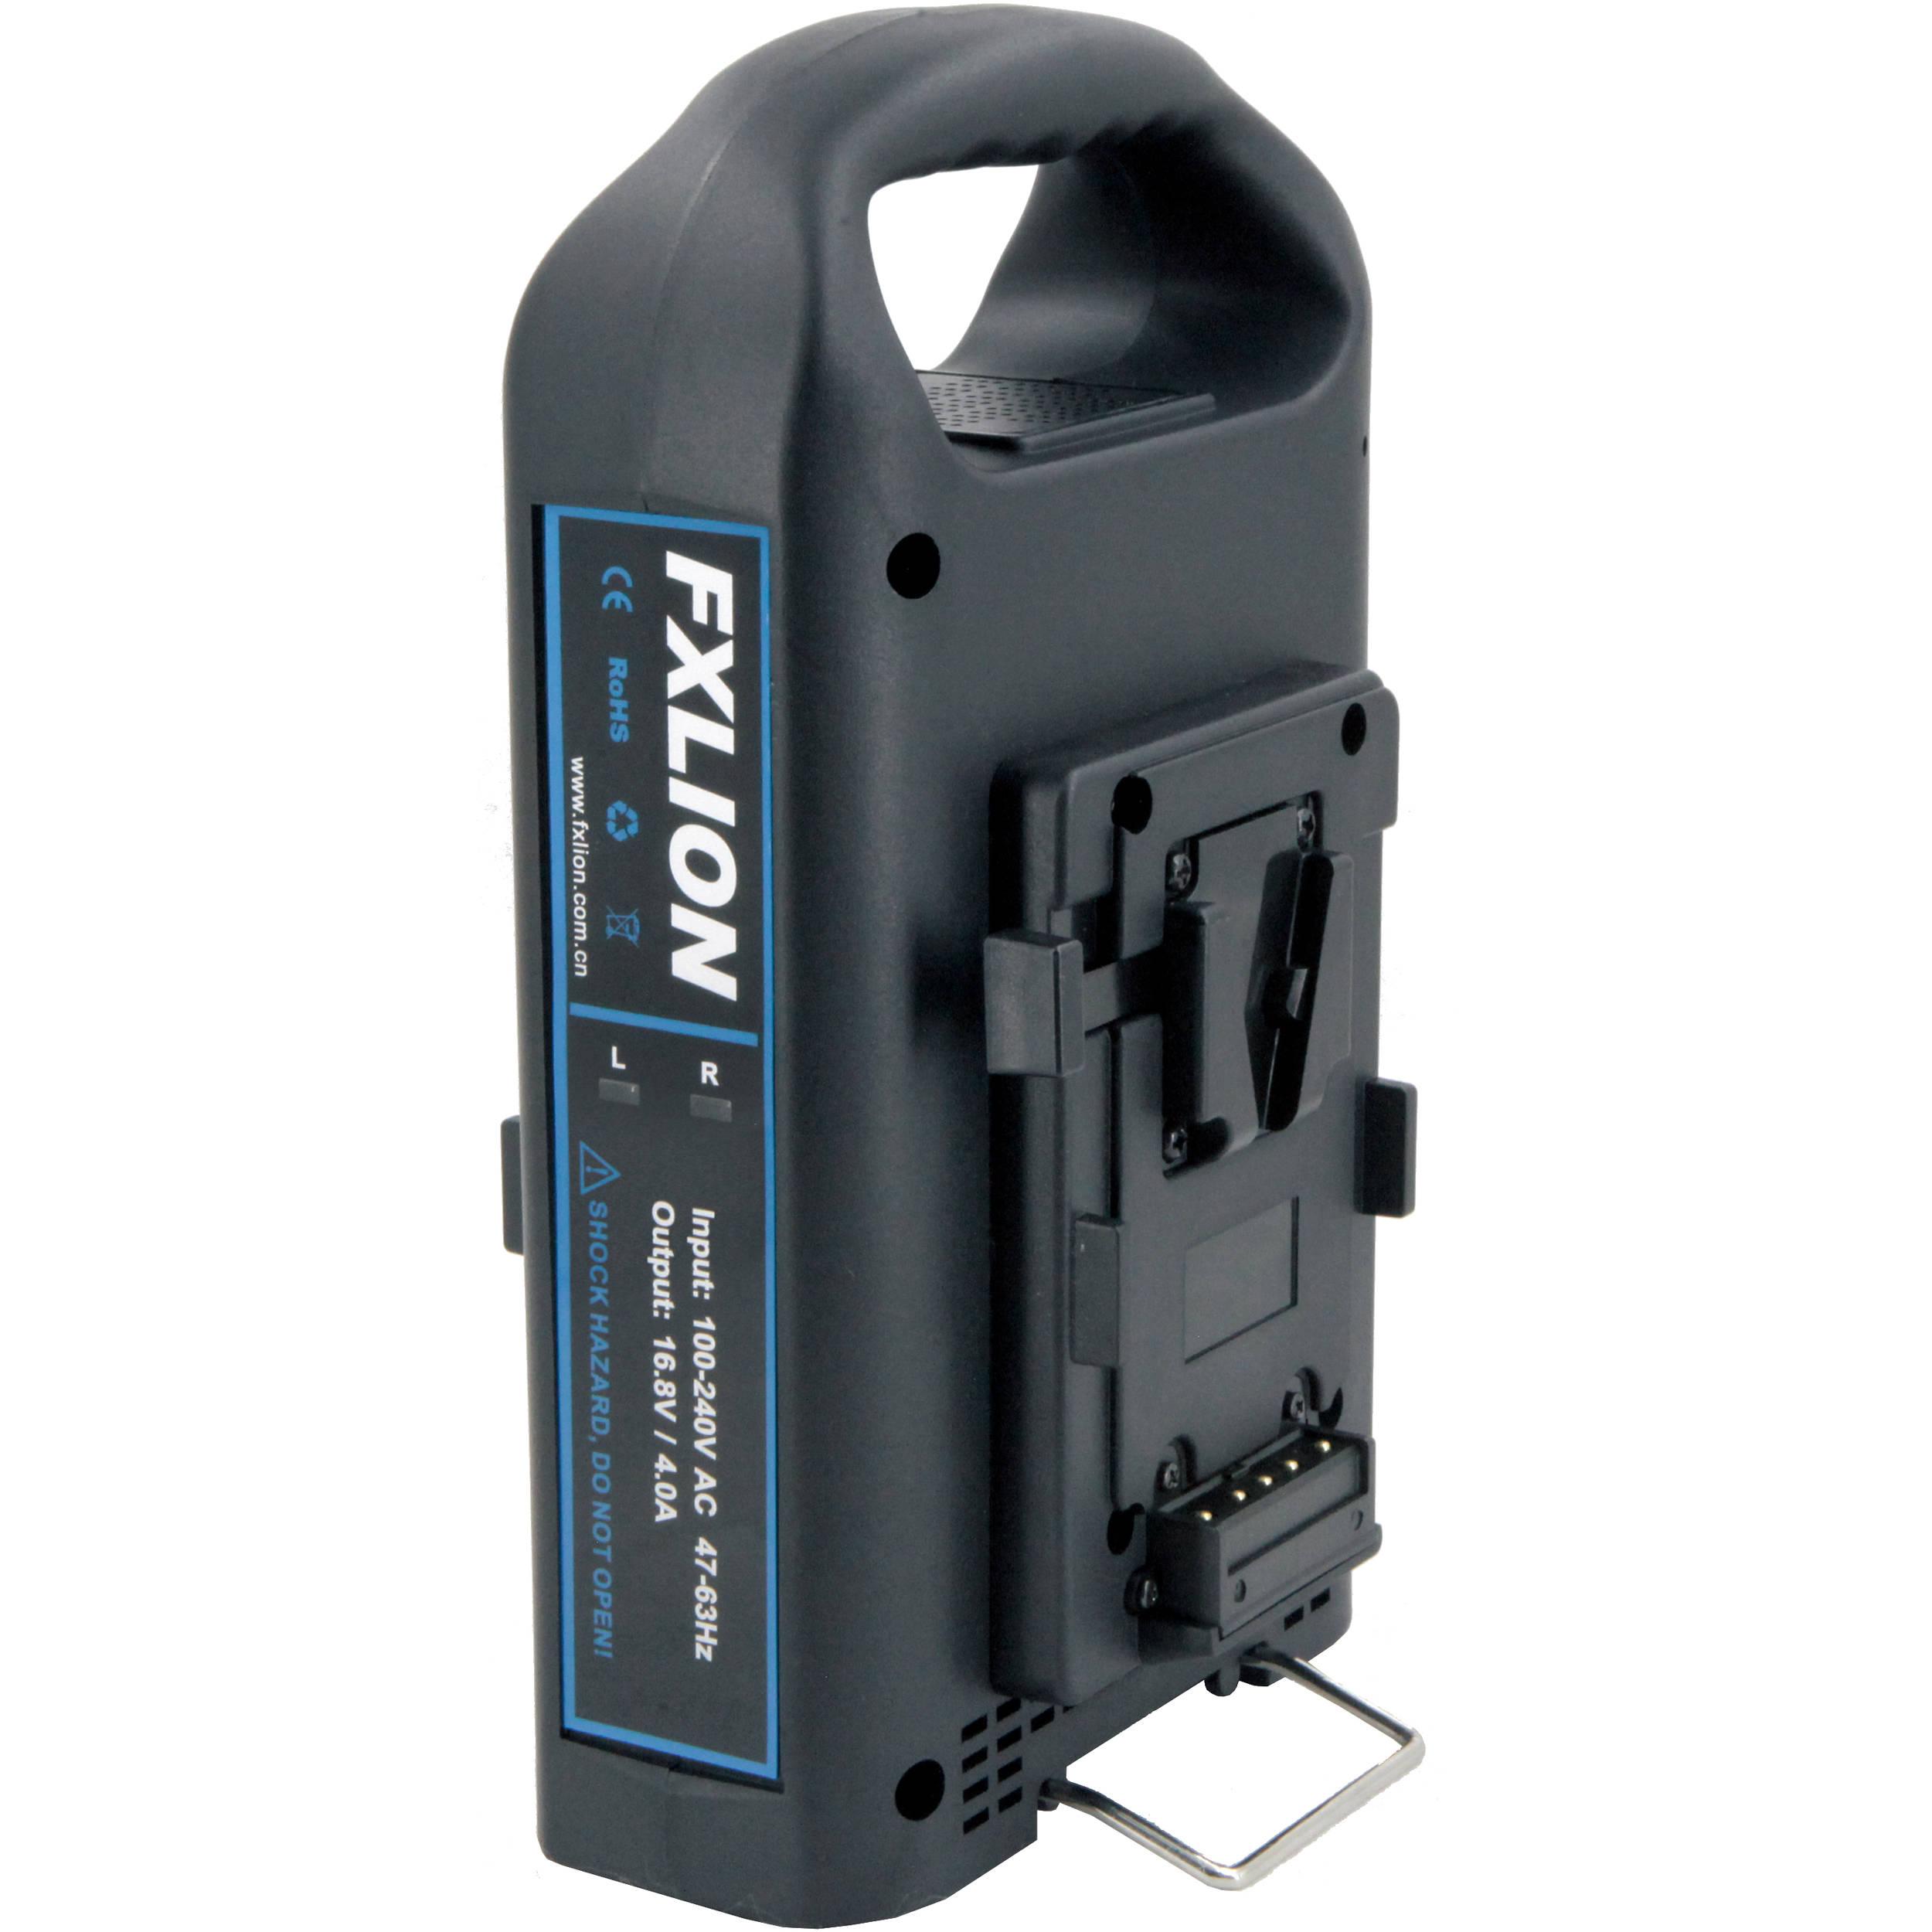 Fxlion Dual Channel V Mount Fast Battery Charger Fxlion